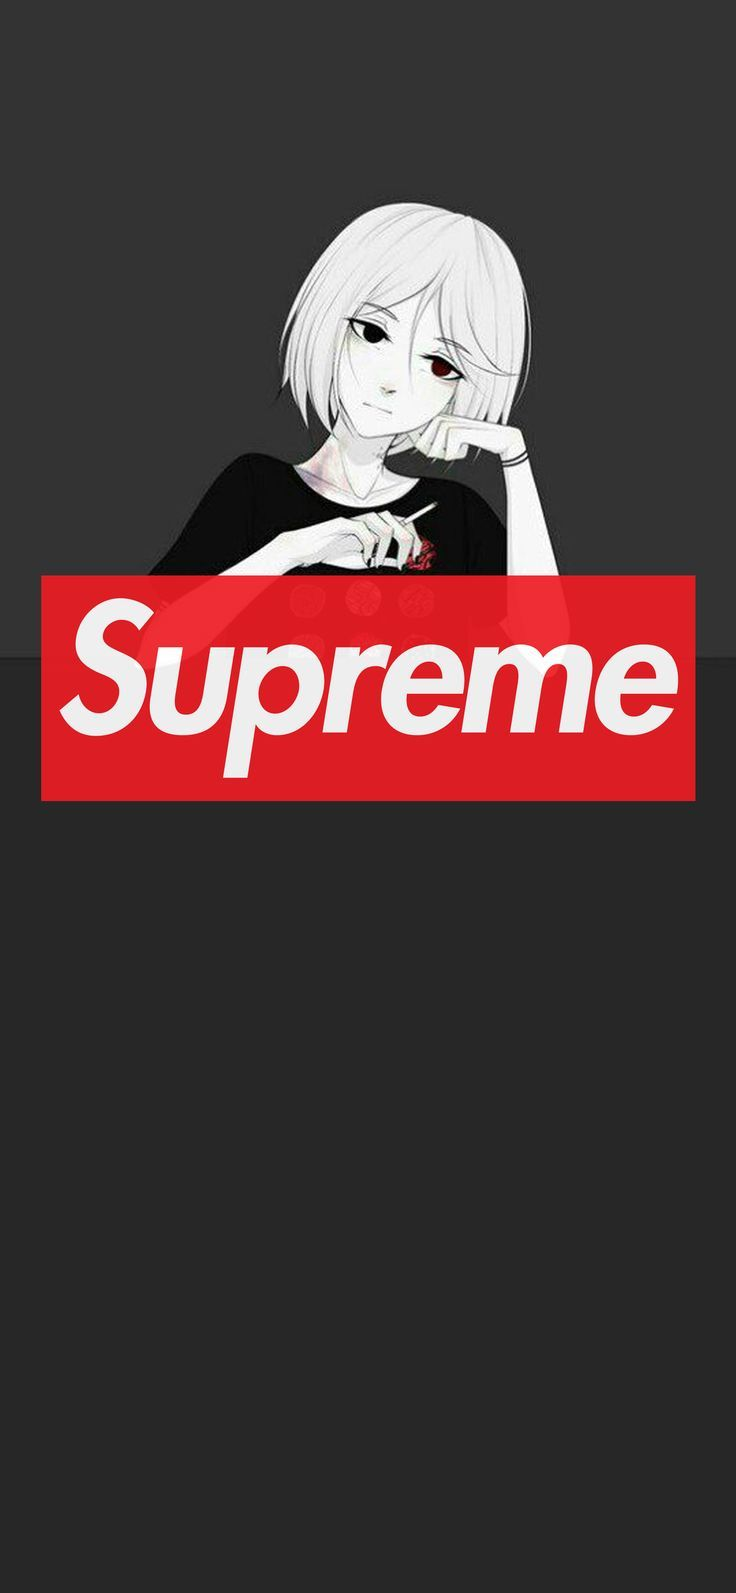 Supreme Anime Hd Wallpapers Wallpaper Cave